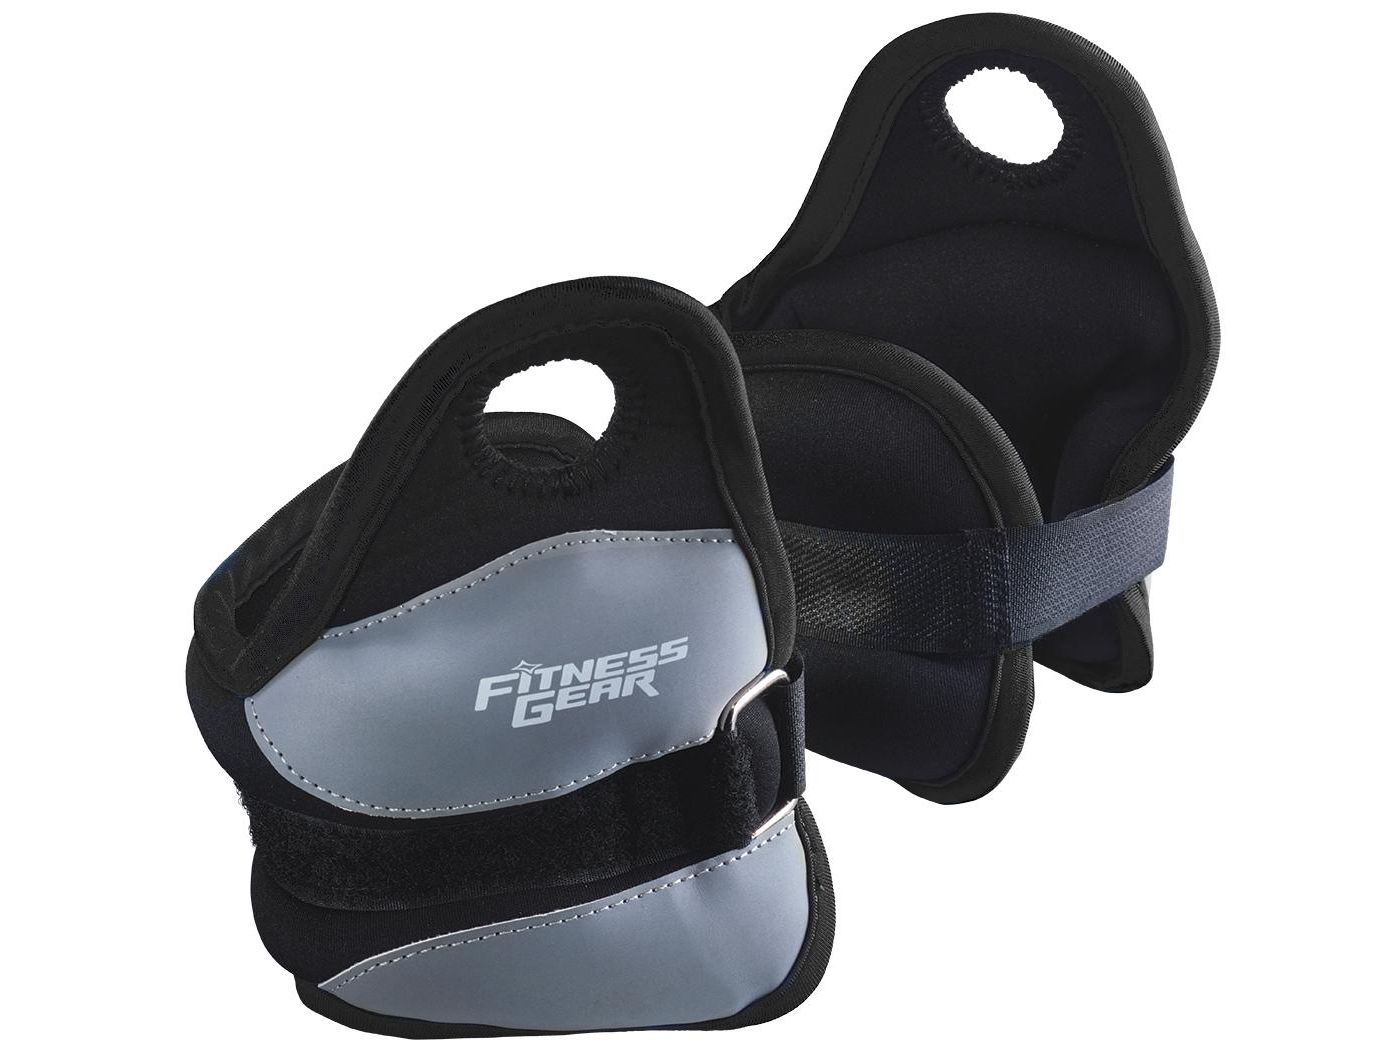 Fitness Gear 2.5 lb. Comfort Wrist Weights – Pair